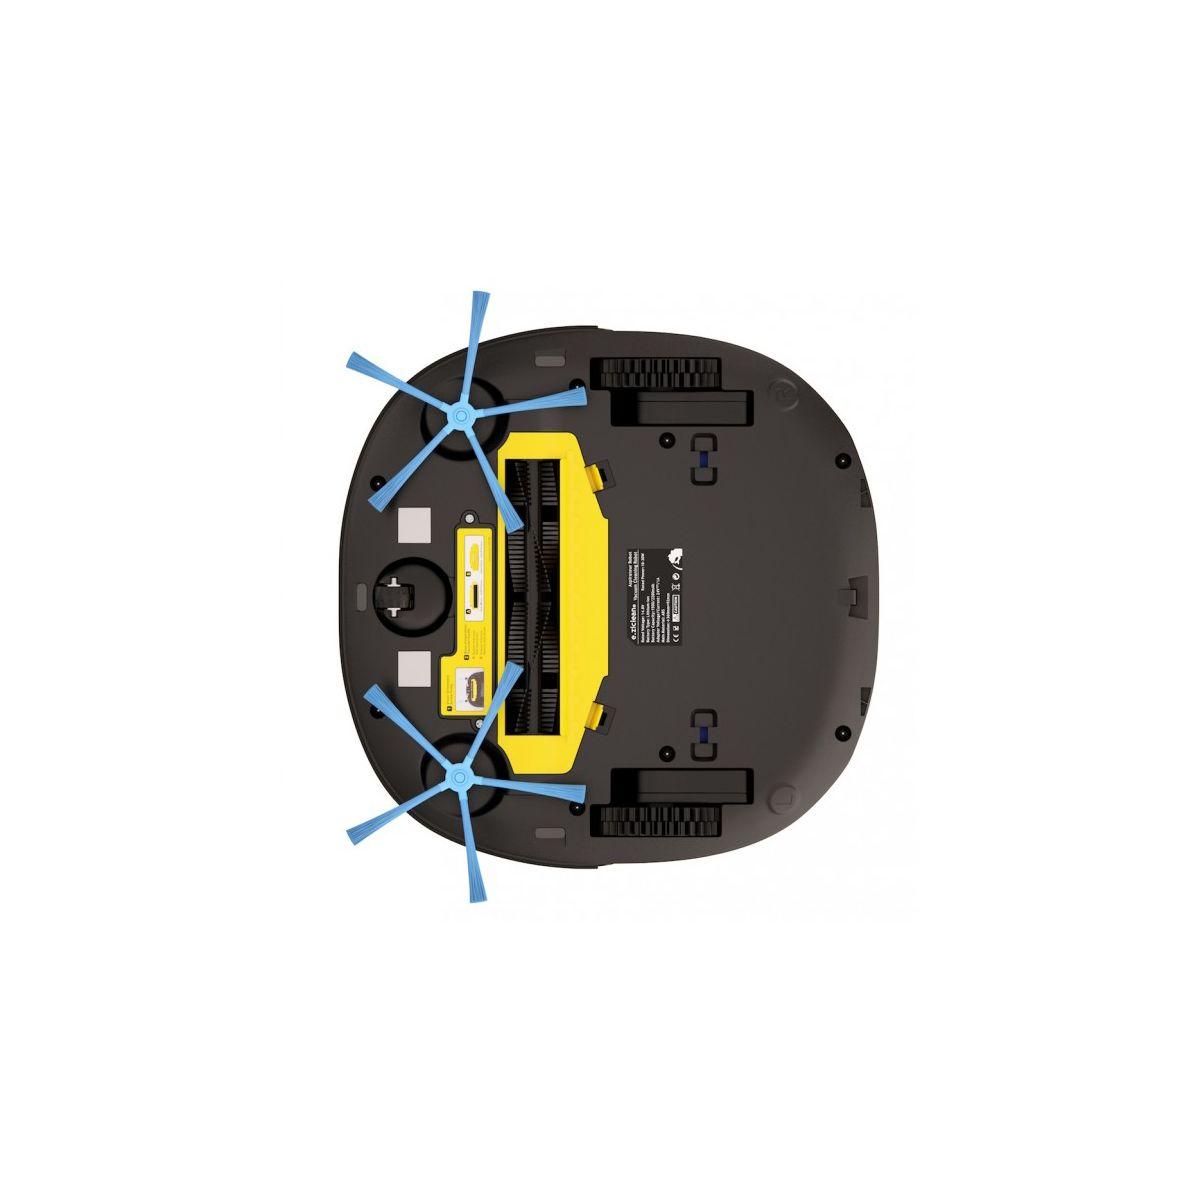 e zicom e ziclean sweepy pets aspirateur robot laveur. Black Bedroom Furniture Sets. Home Design Ideas